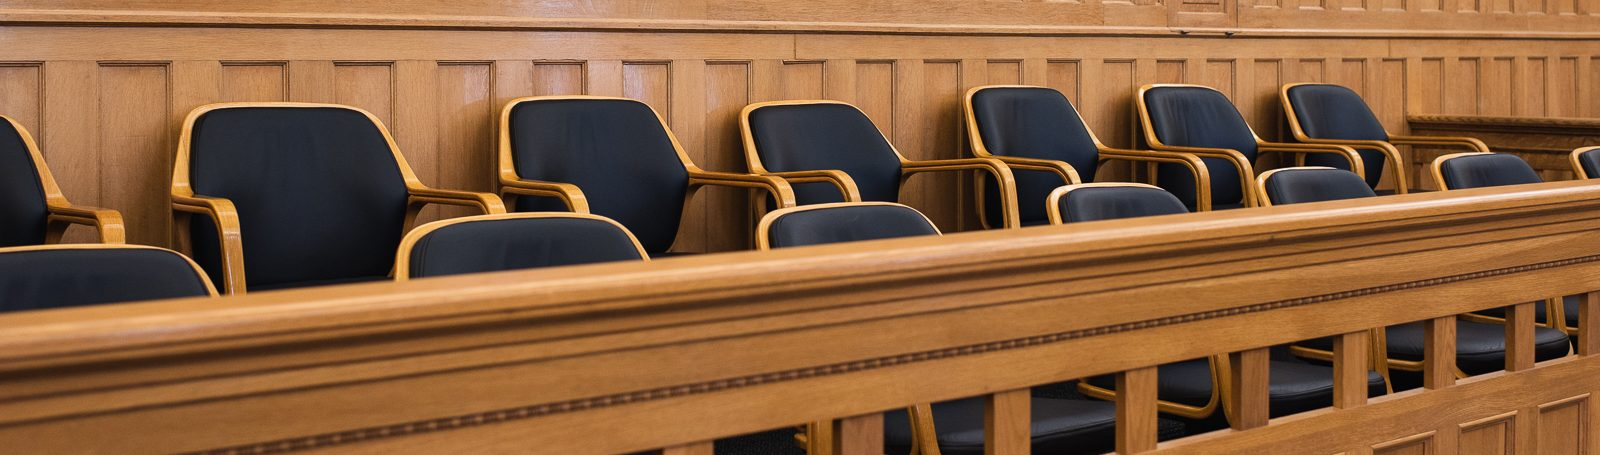 Jury bench